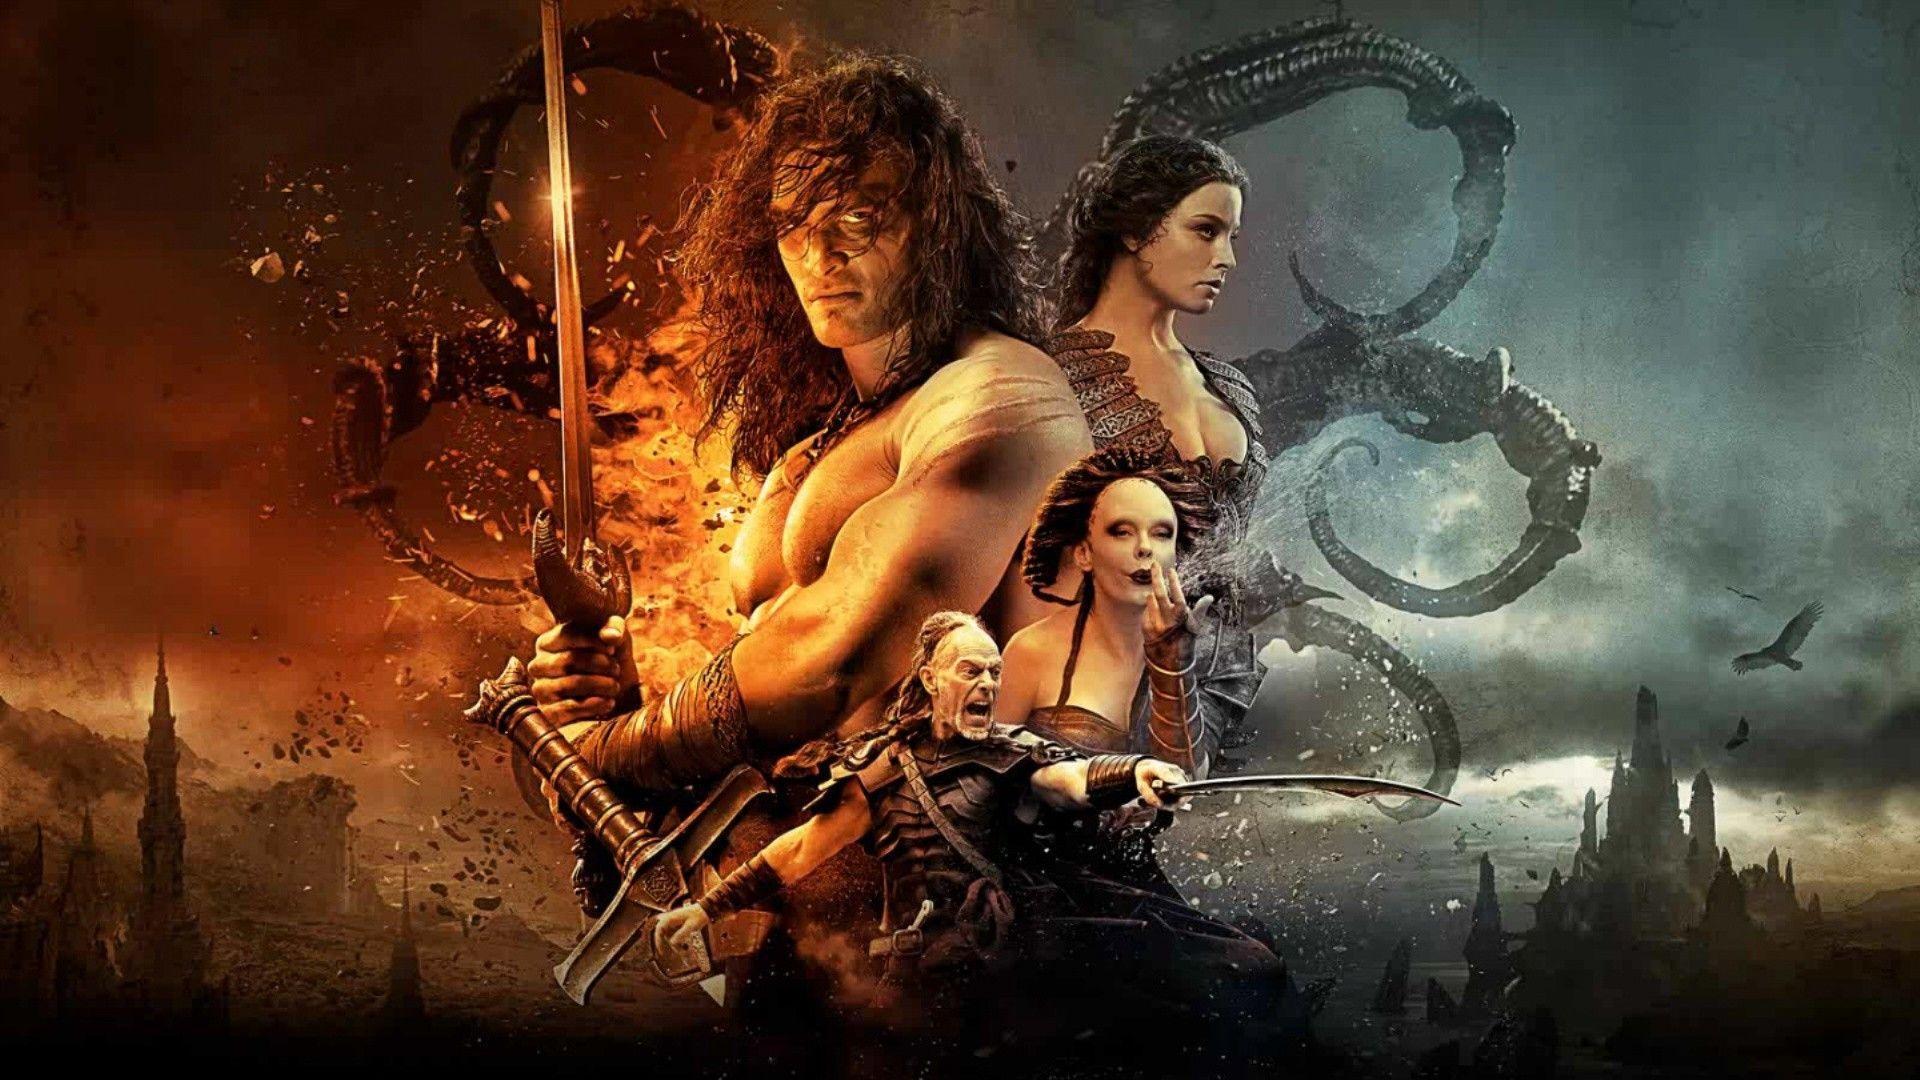 Conan The Barbarian Wallpapers Wallpaper Cave